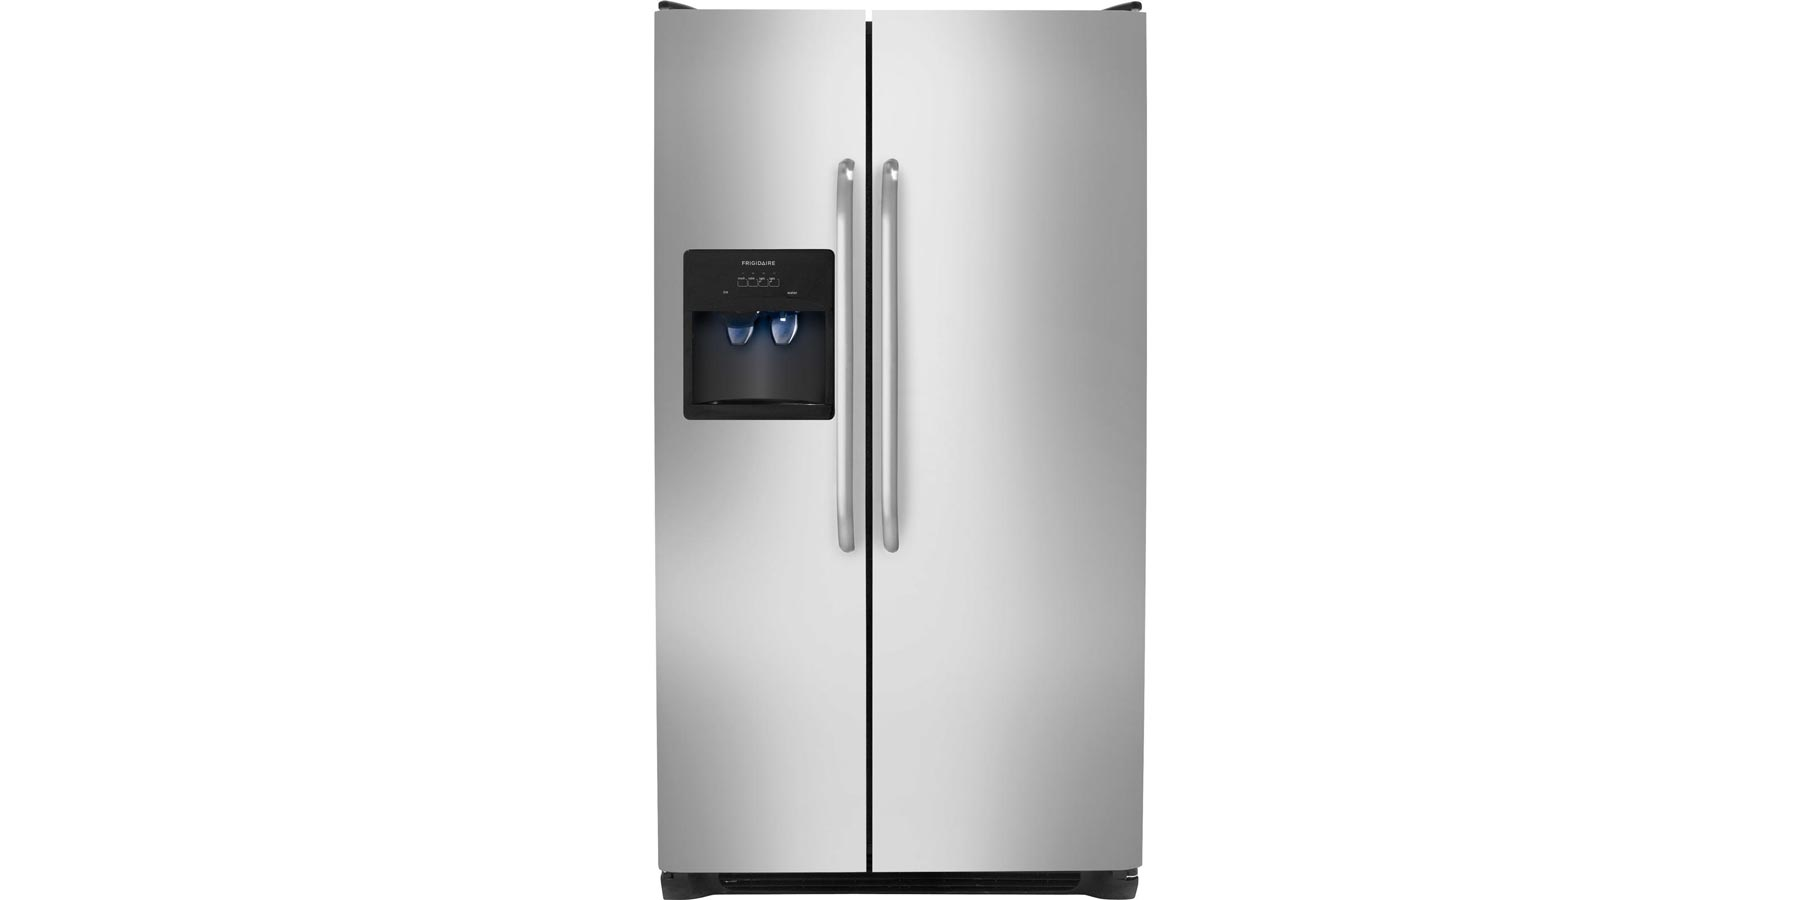 Frigidaire 25 6 Cu Ft Side By Side Refrigerator